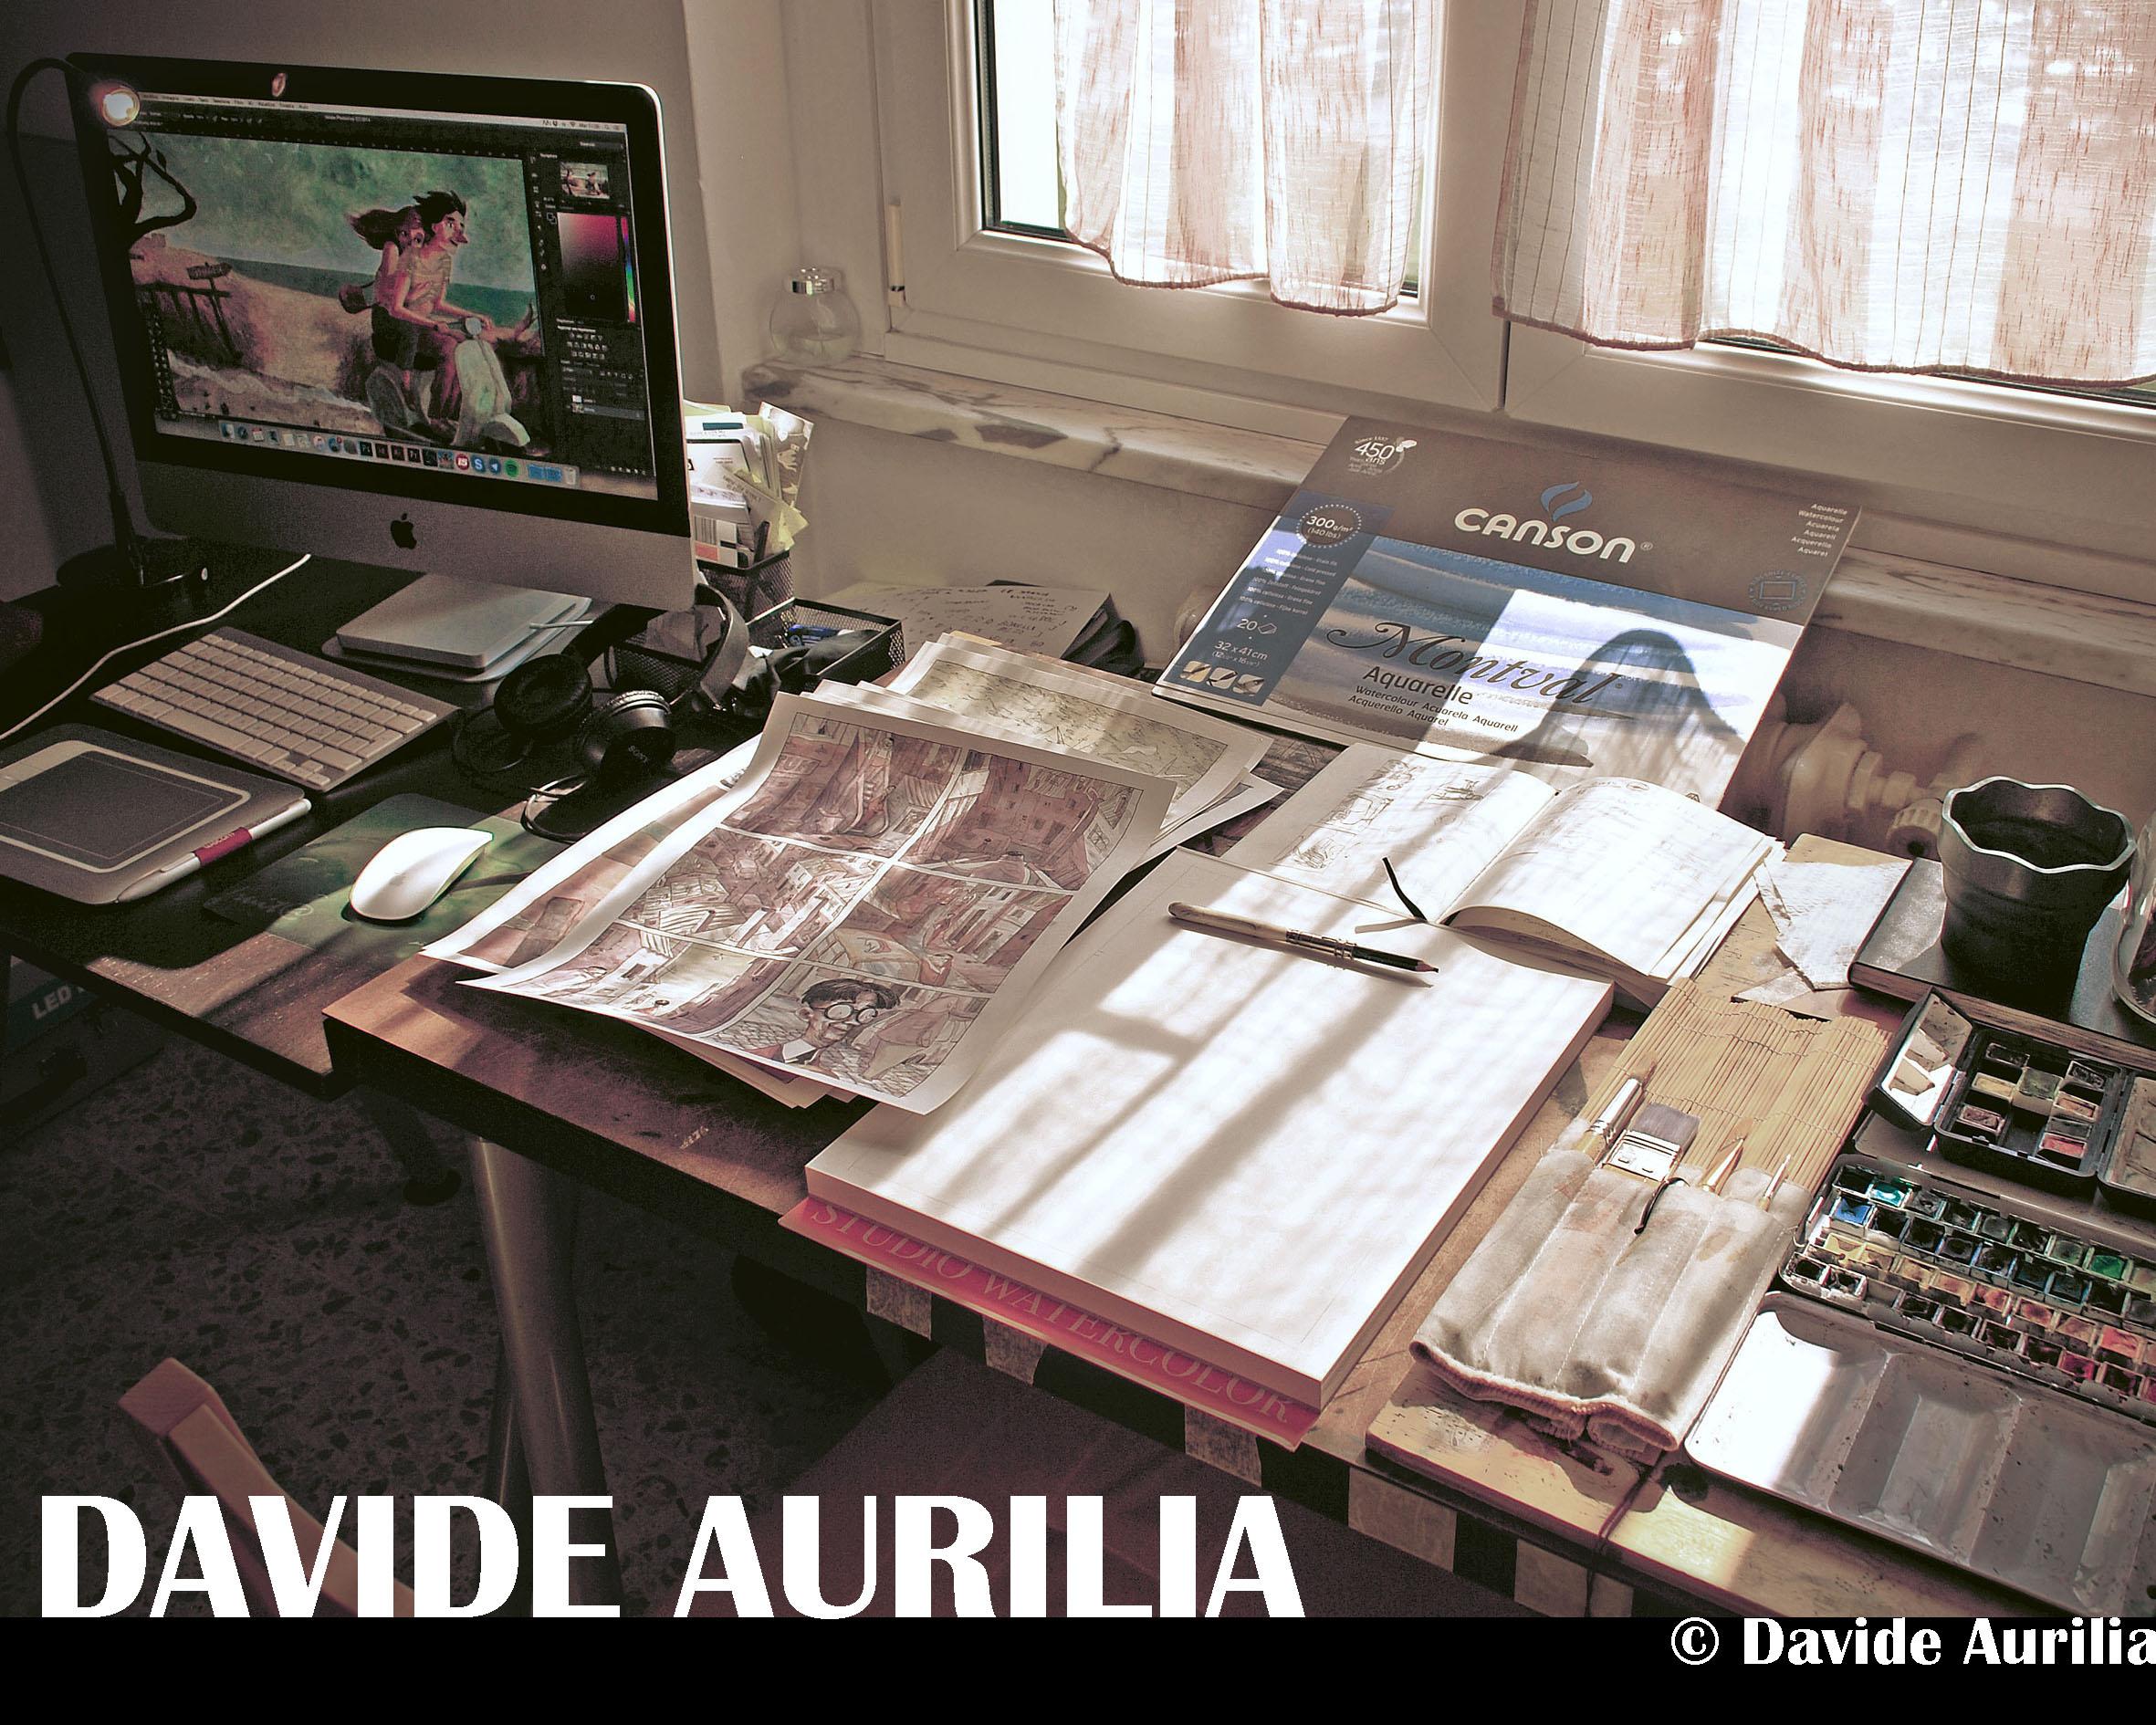 Davide Aurilia